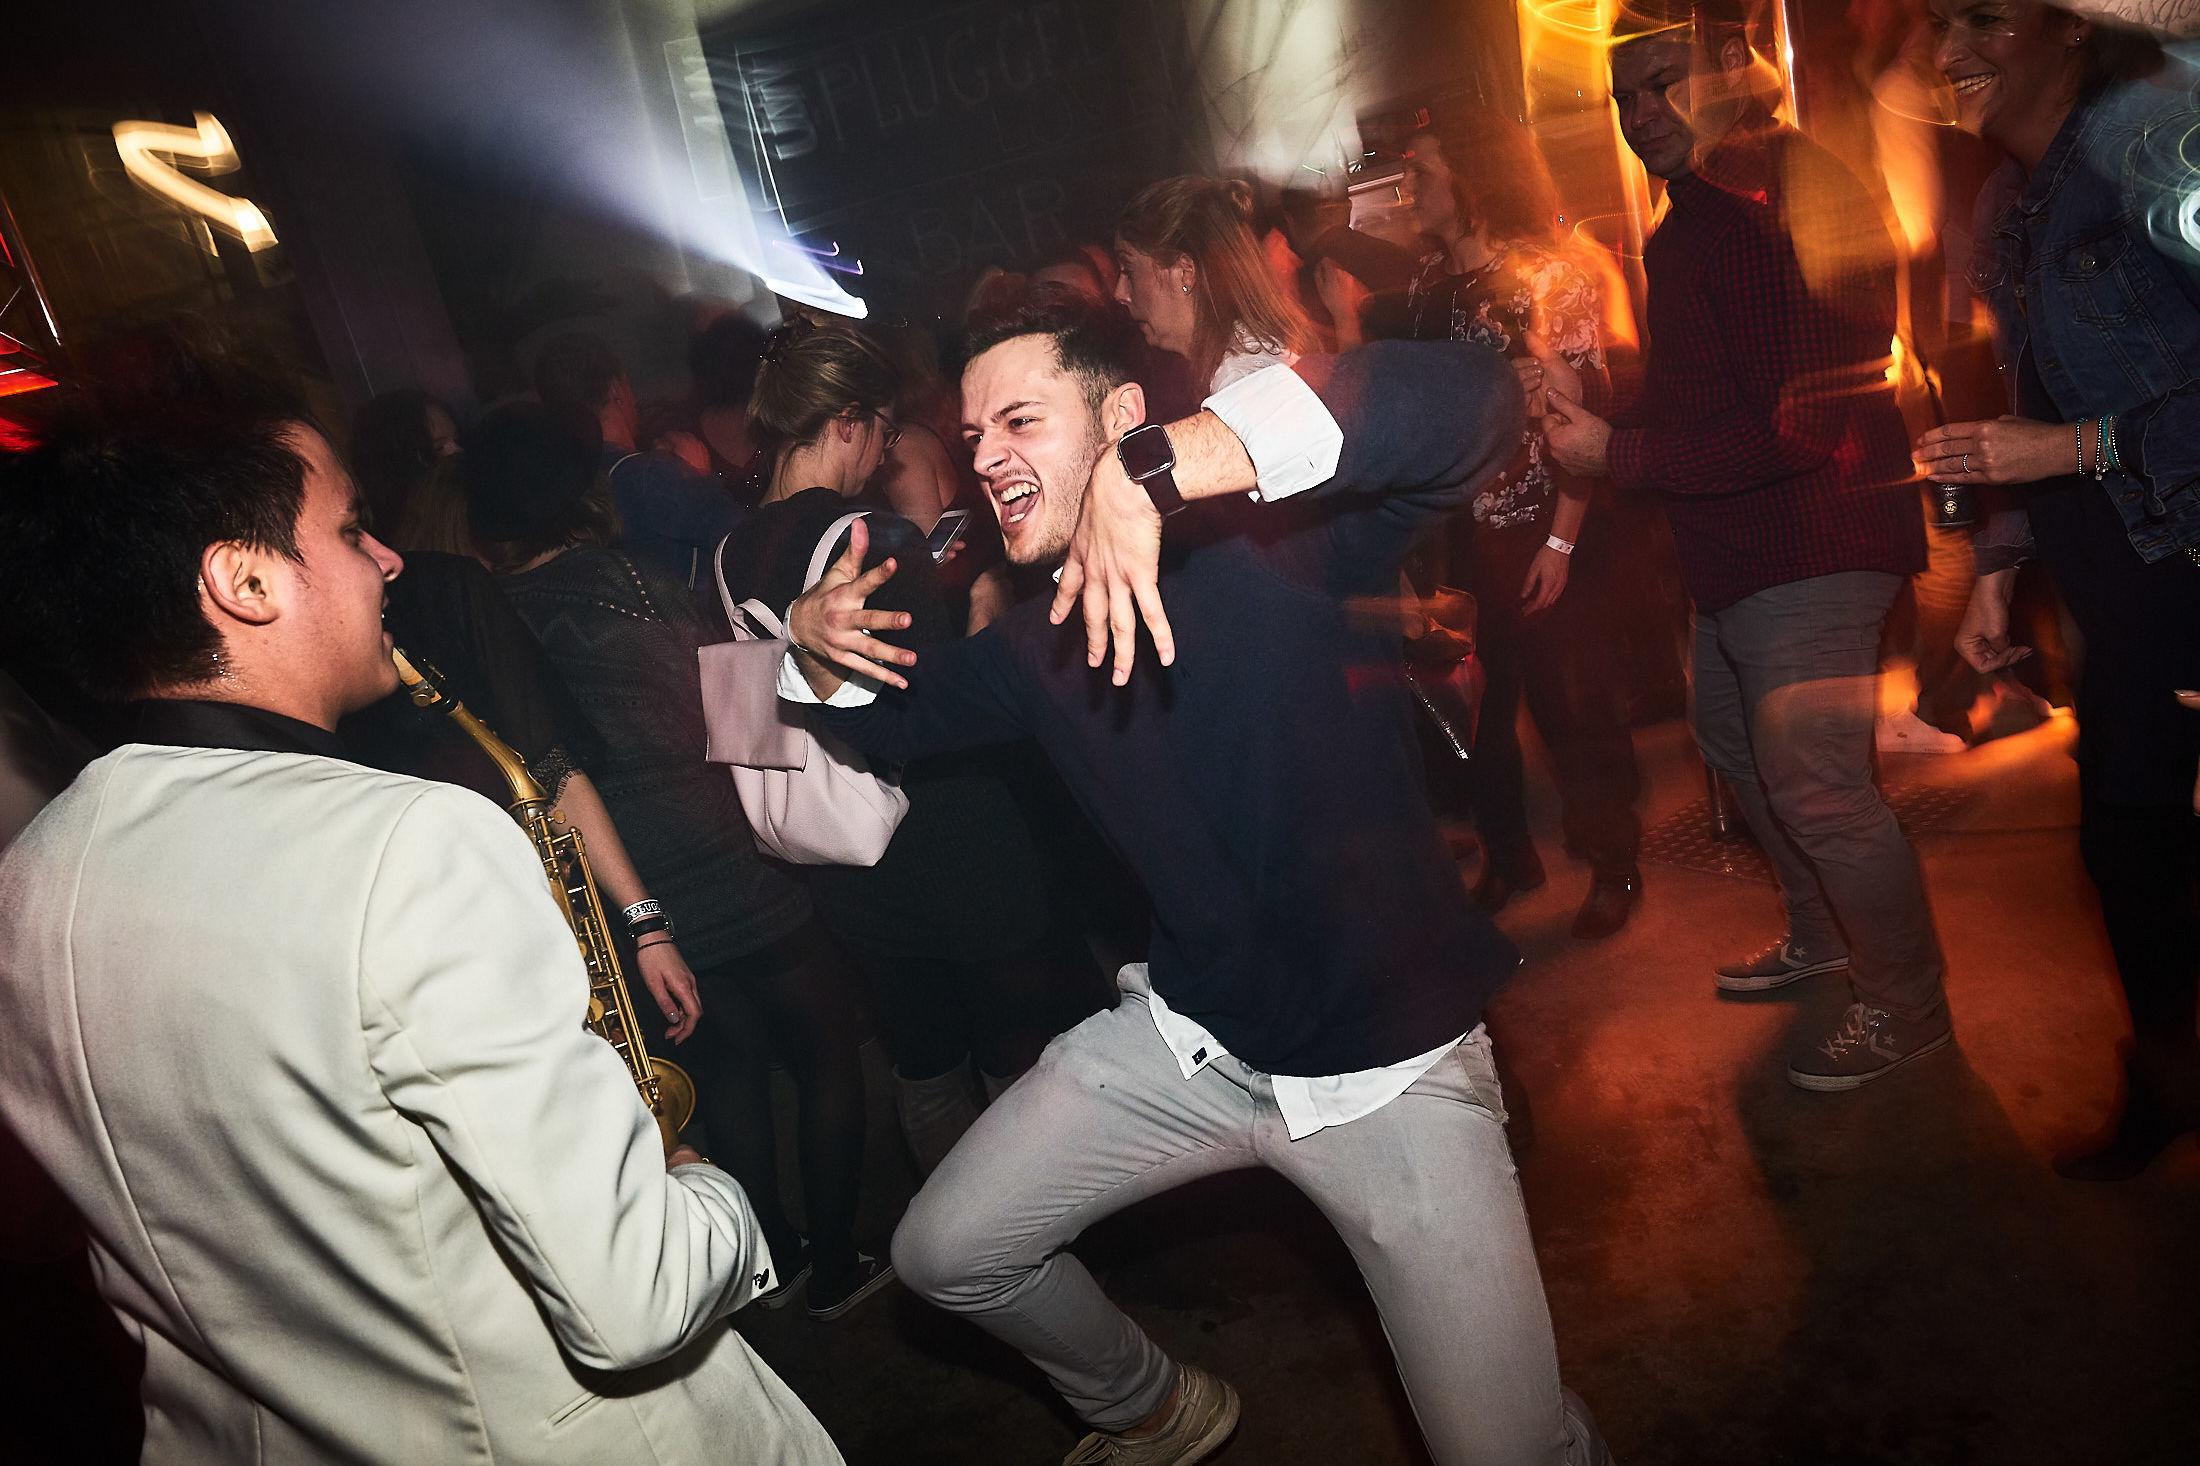 DJ | Hannover | DJ | Braunschweig | DJ | Peine | DJ | Agentur | DJ | Service | DJ | Messe | DJ | Firmenevent | Firmenfeier | DJ | Weihnachtsfeier | DJ | Sommerfest | DJ | Weihnachtsfeier | Buchen | Anfragen | Lehmann | Eventservice